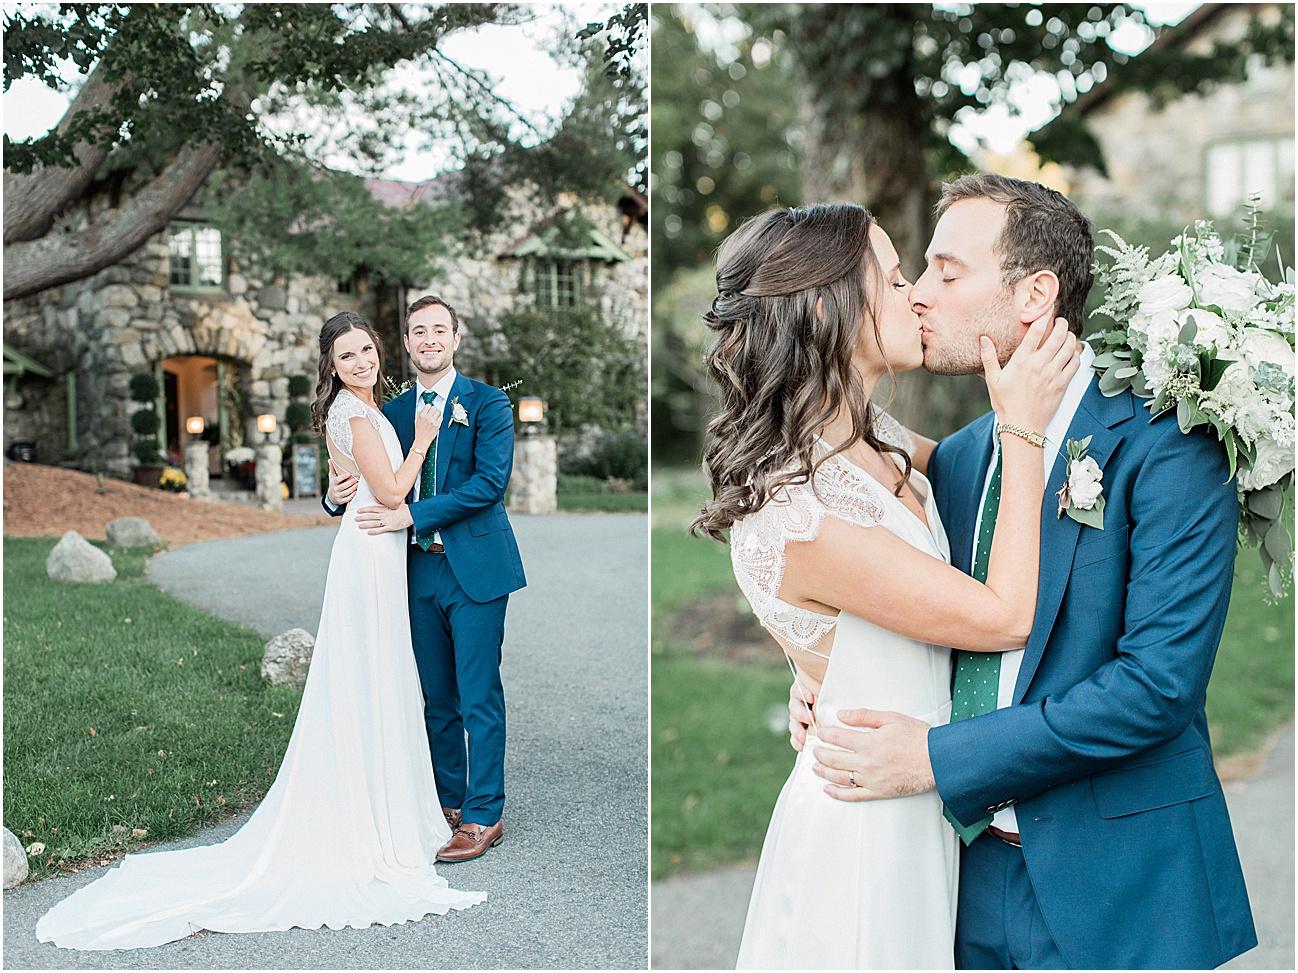 jenna_mike_willowdale_estate_topsfield_neutral_whites_greens_fall_cape_cod_boston_wedding_photographer_meredith_jane_photography_photo_1455.jpg